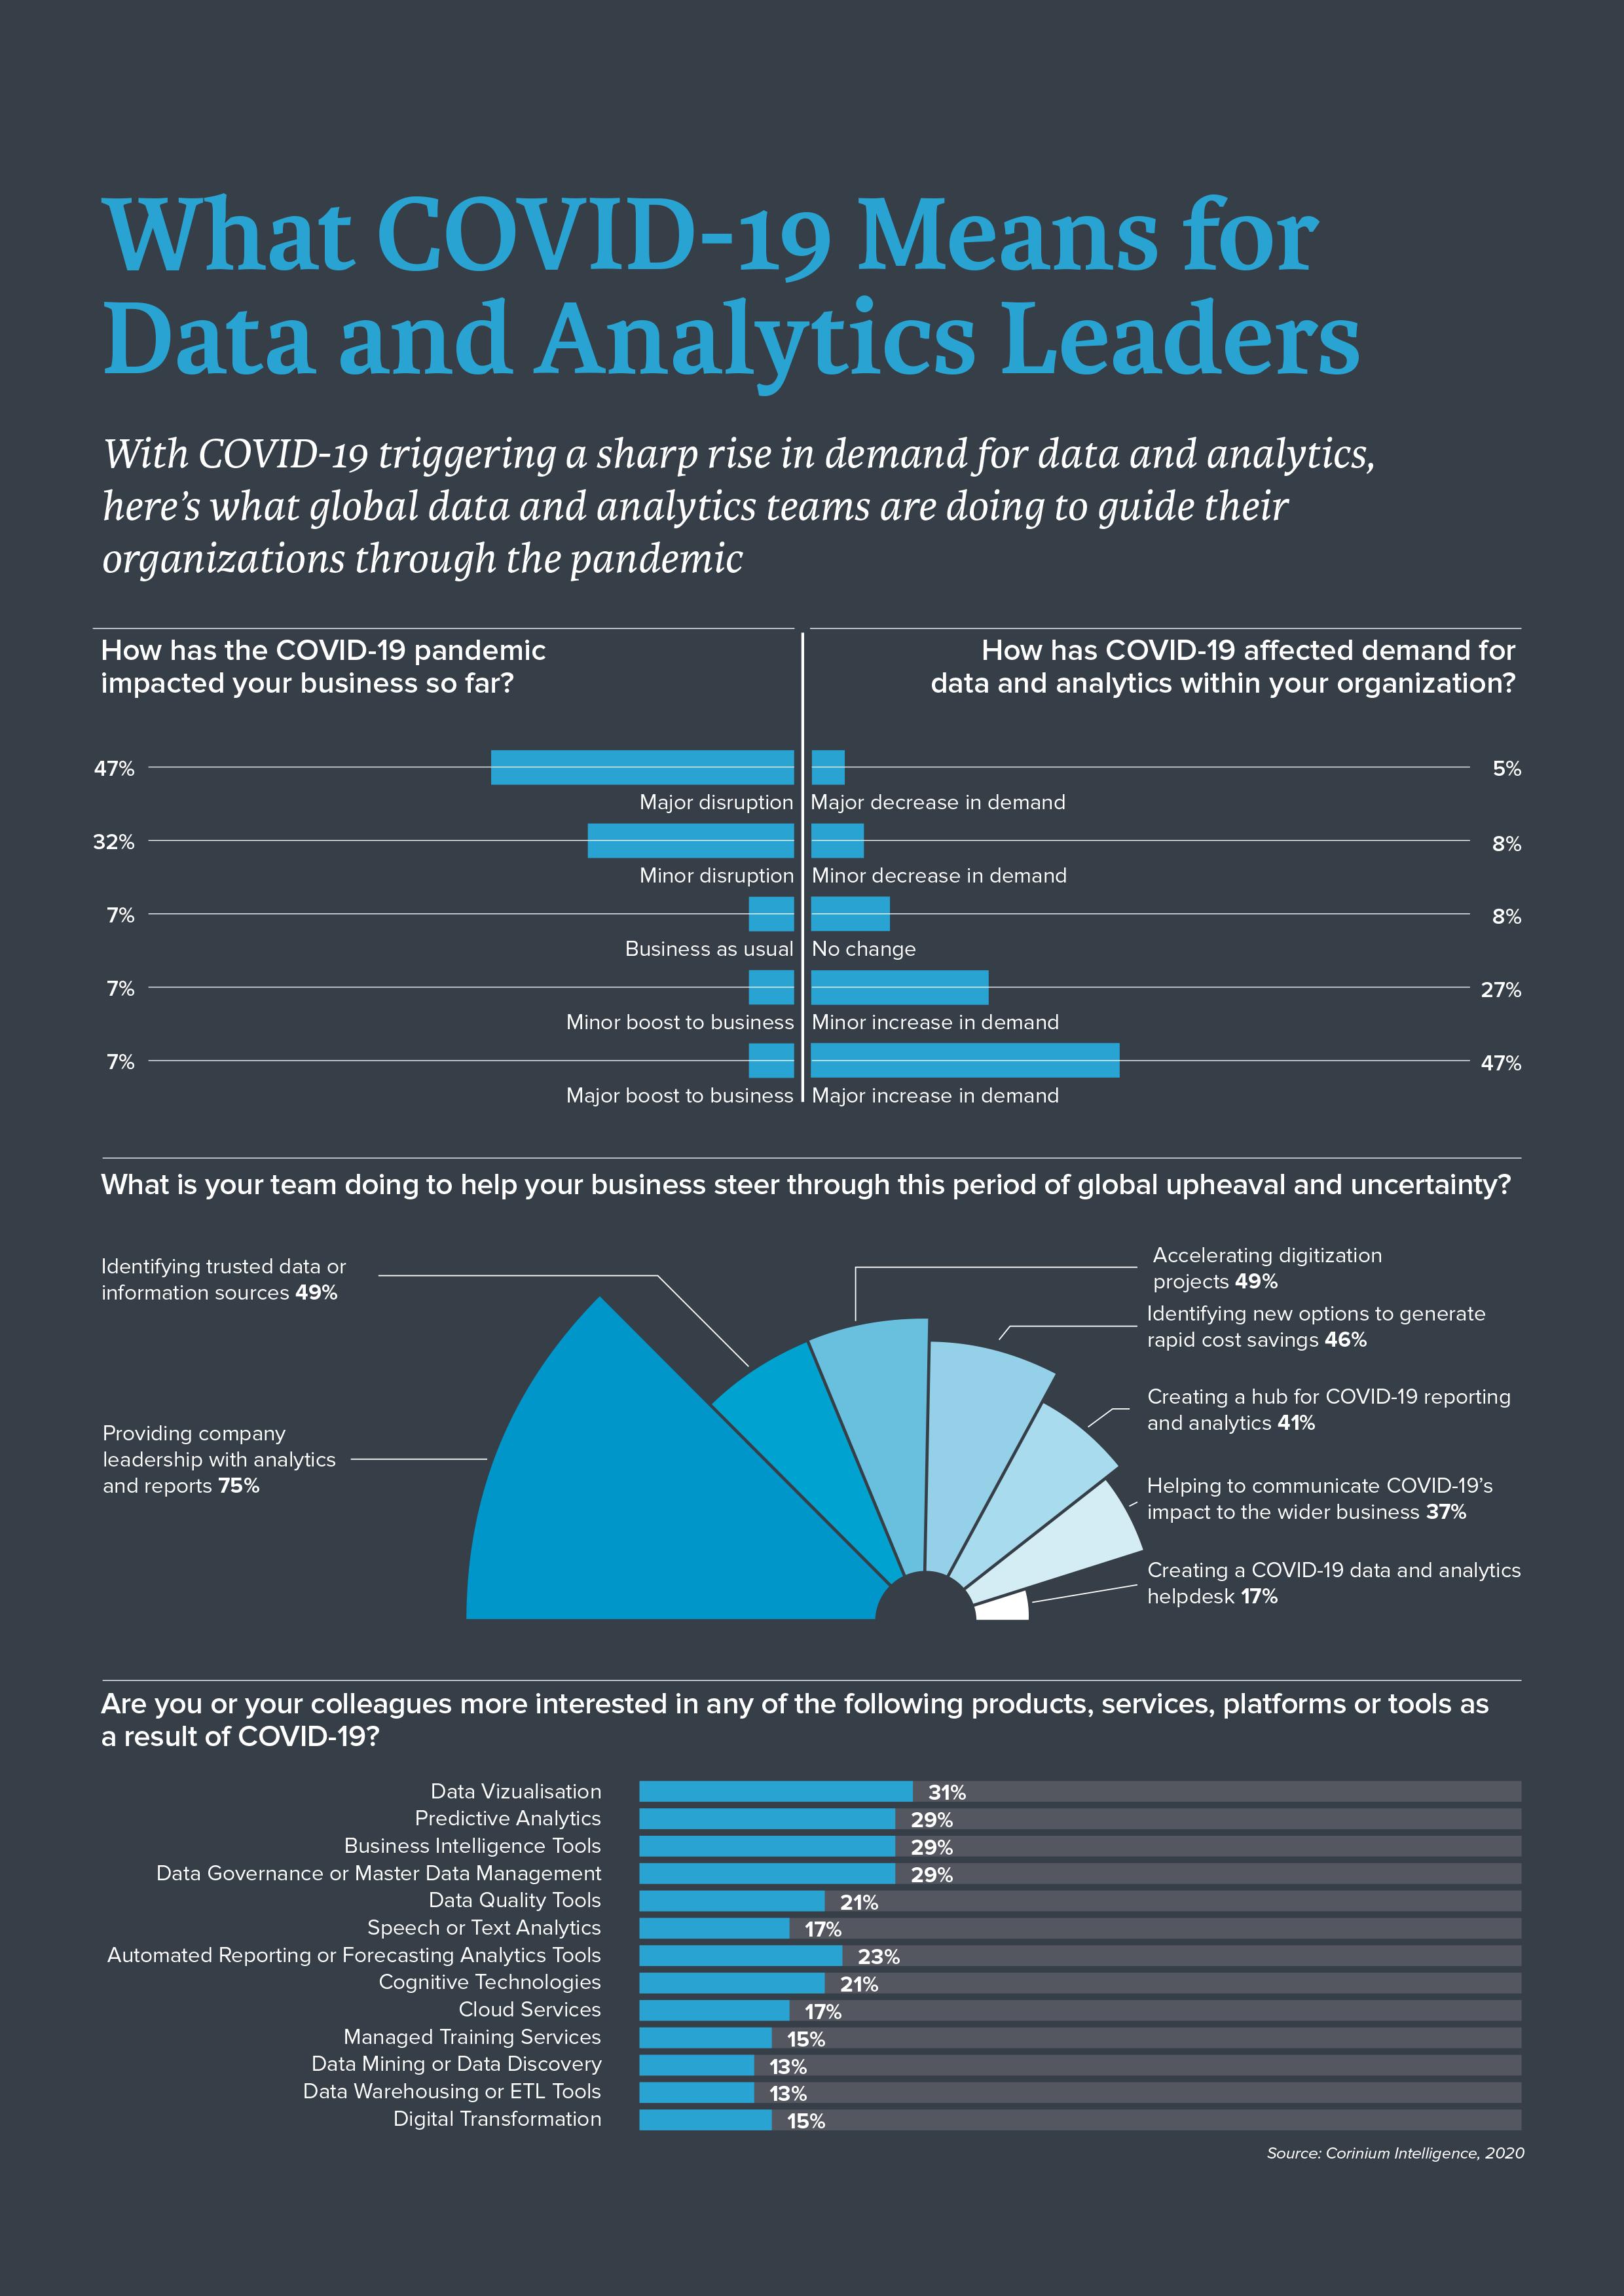 CUserssolomDocumentsCorinium IntelligenceCorinium Content2020 State of Data & Analytics USWhat COVID-19 Means for Data Leaders